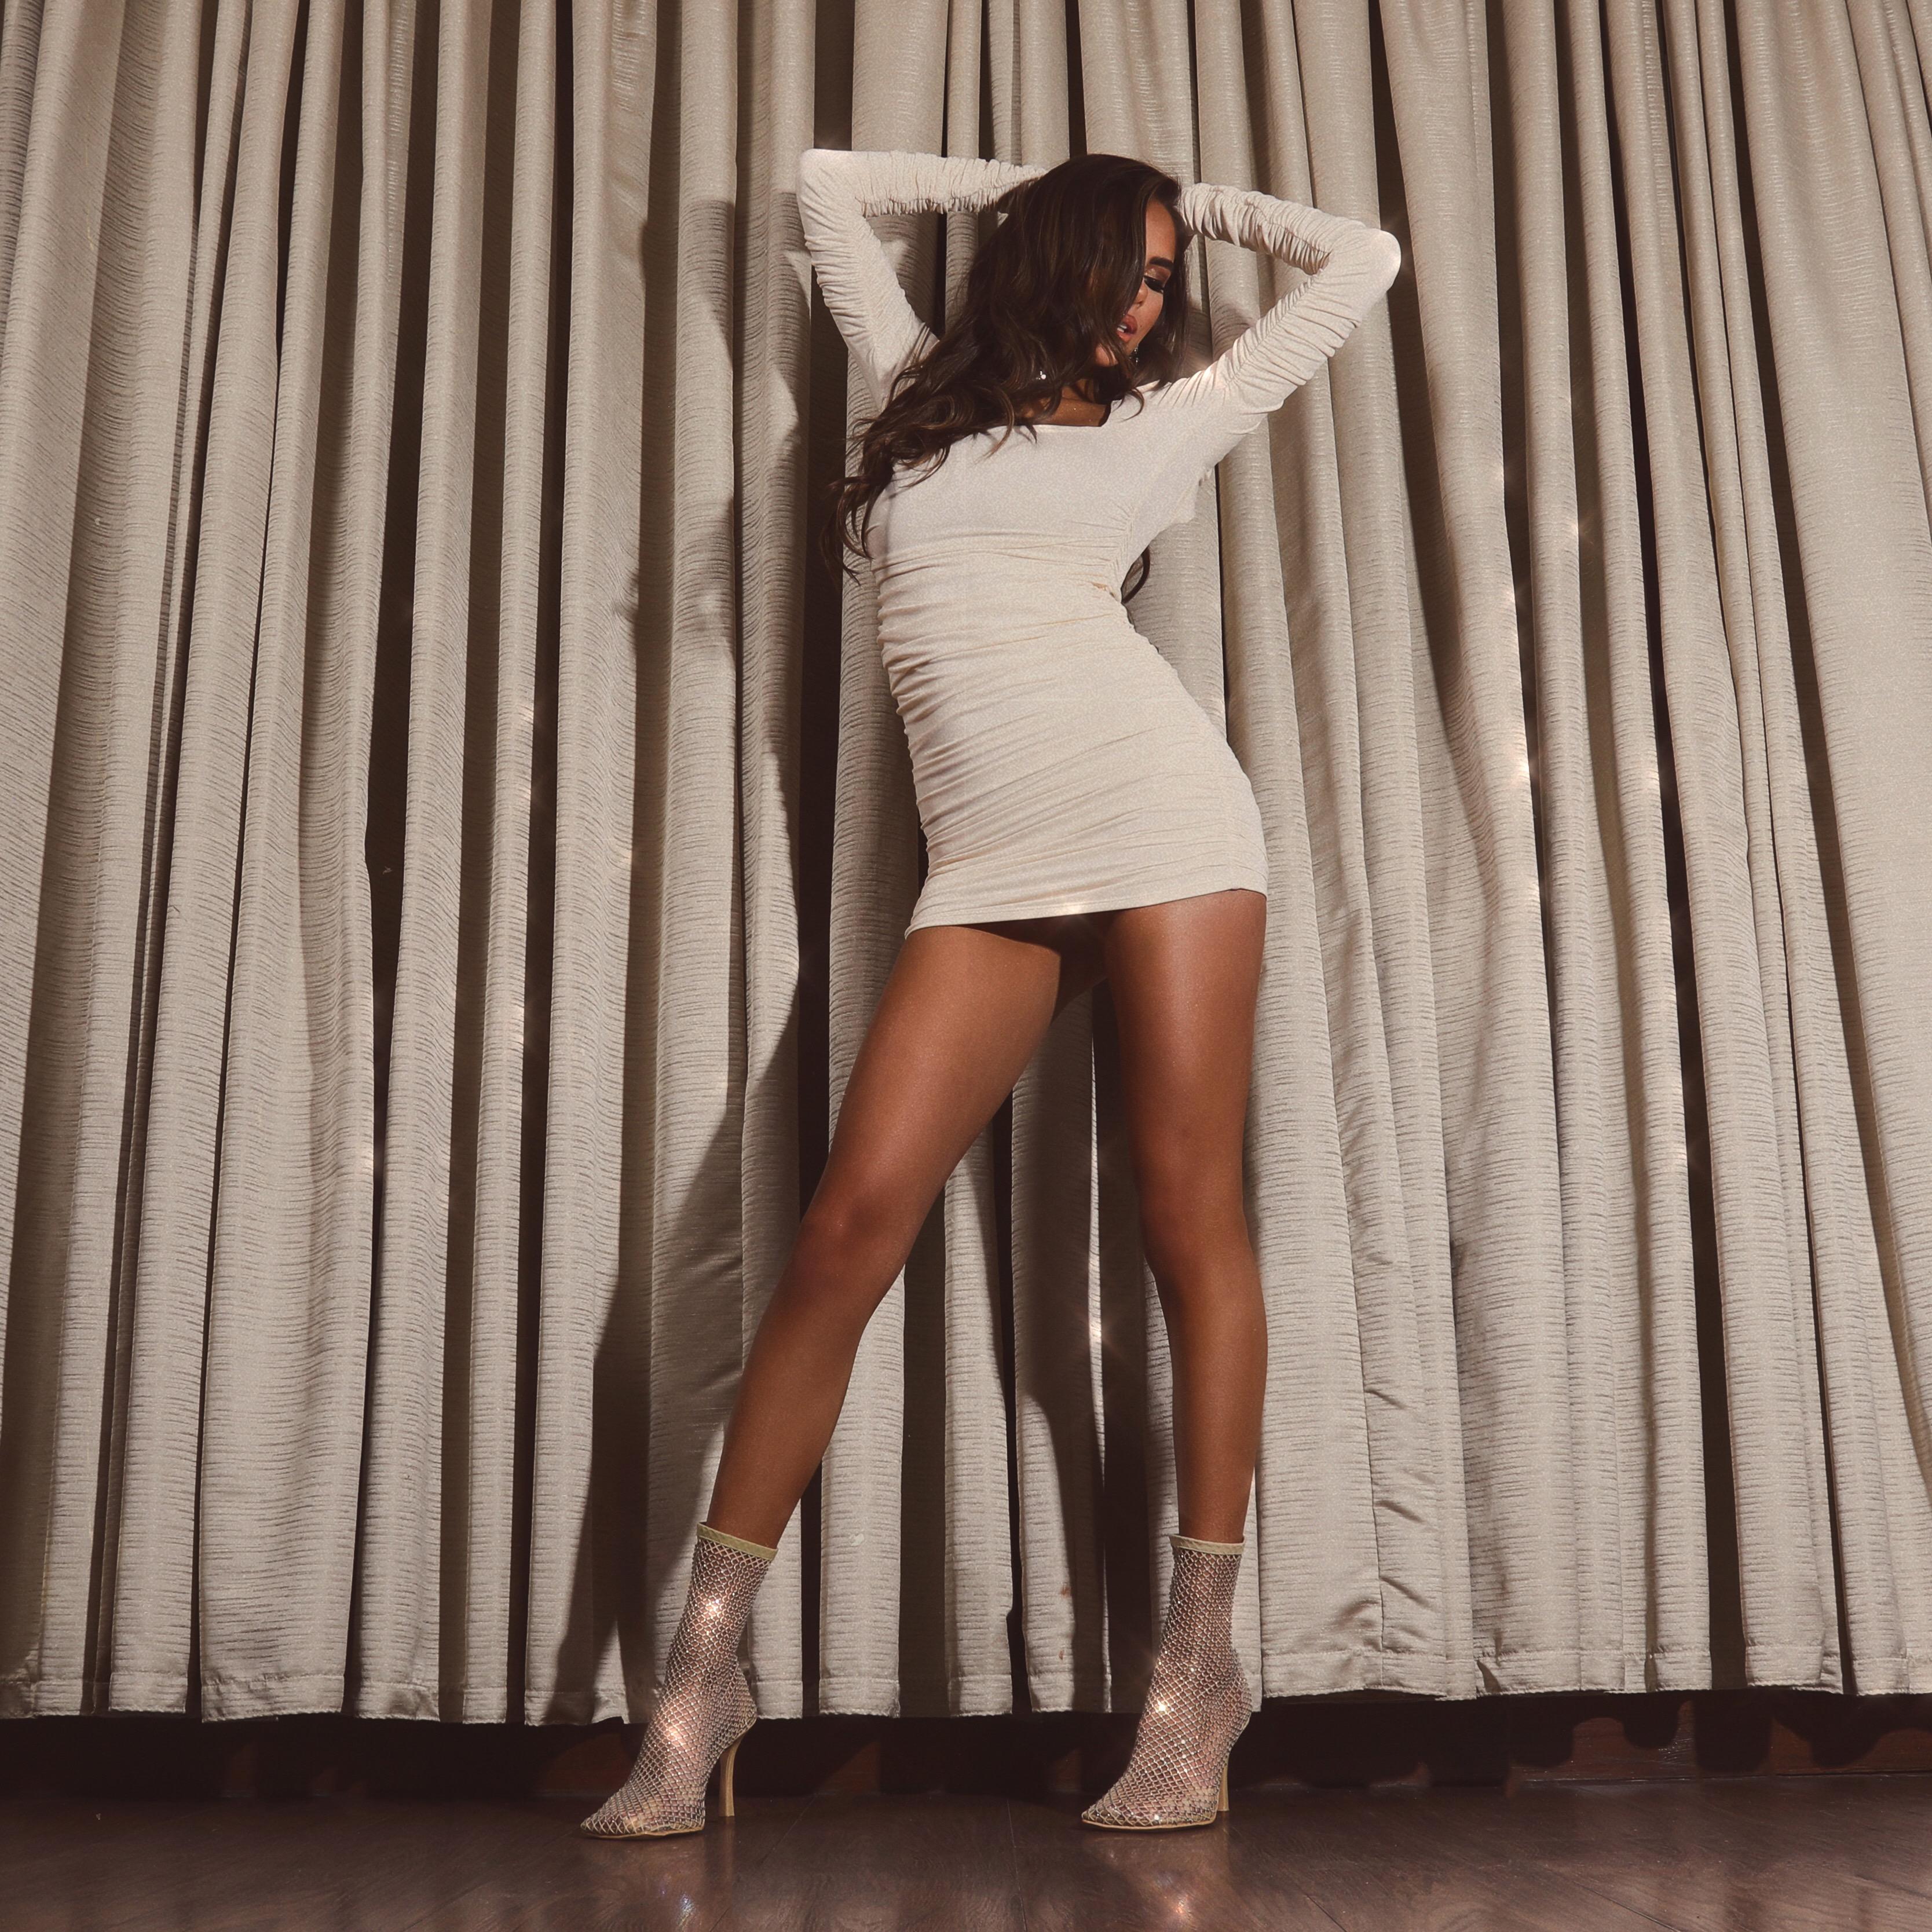 Minnie Square Toe Diamante Detail Fishnet Heel In Nude